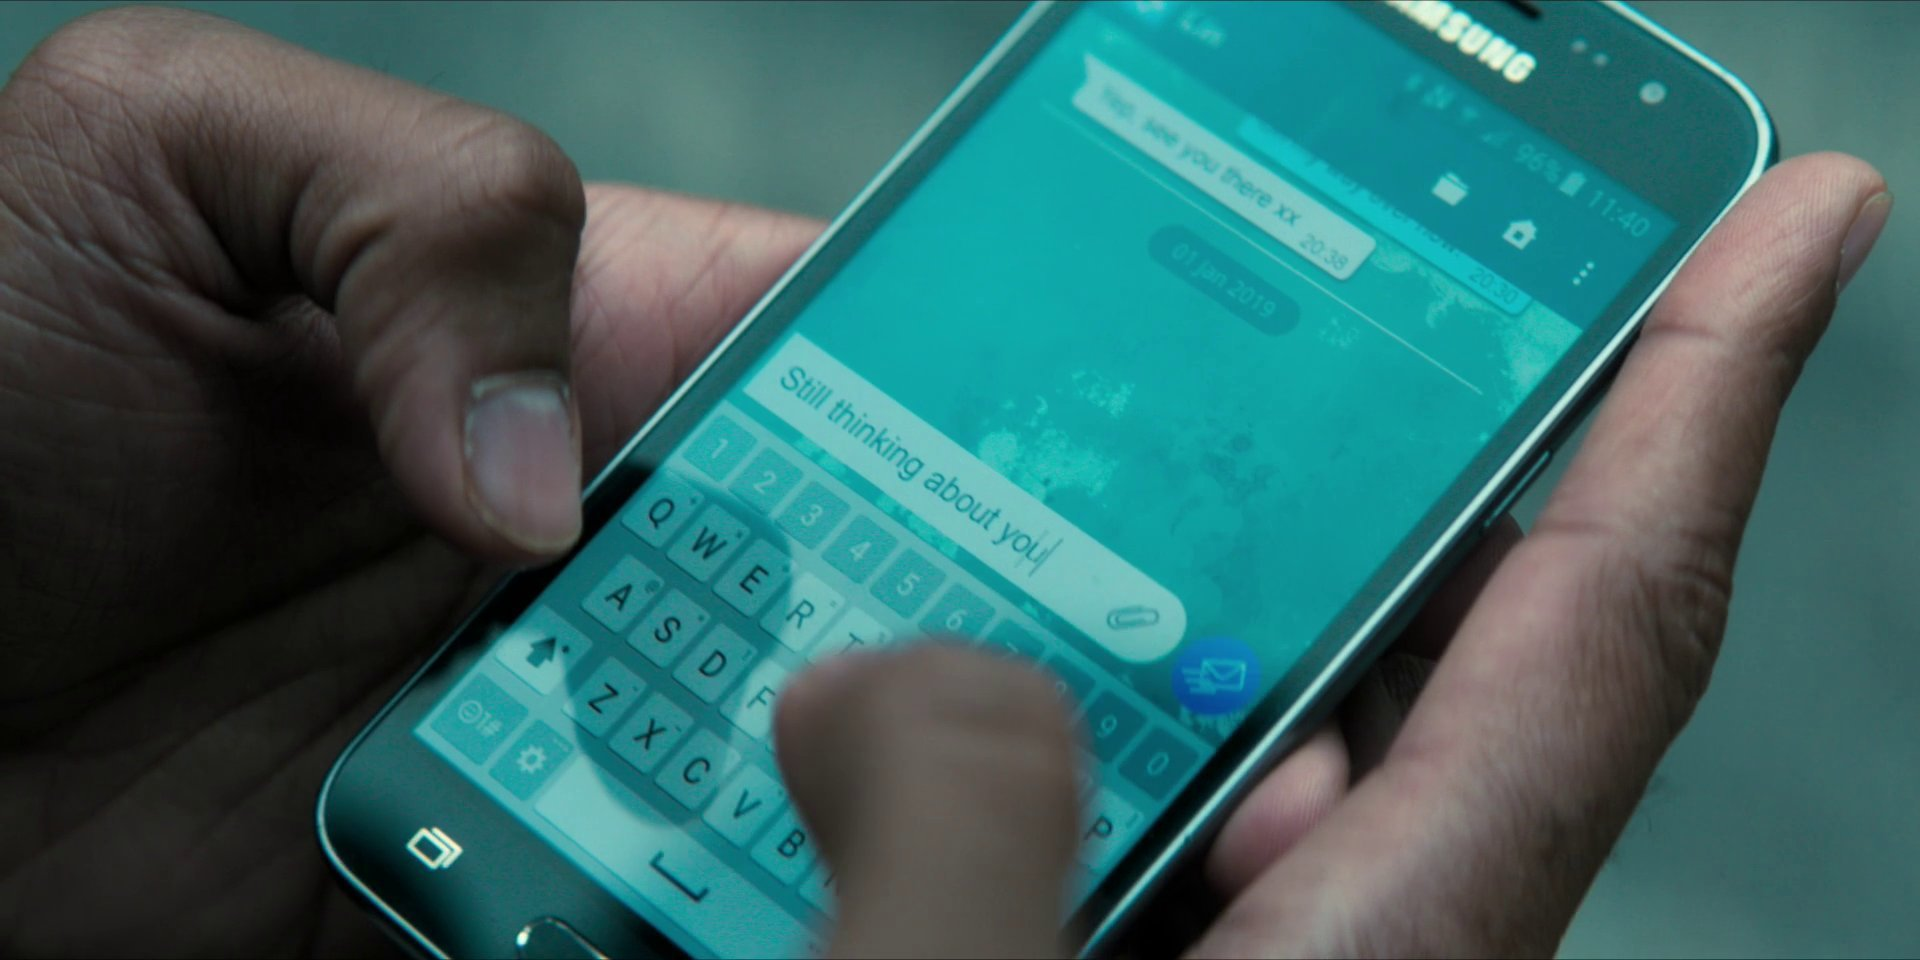 Mitch's phone.